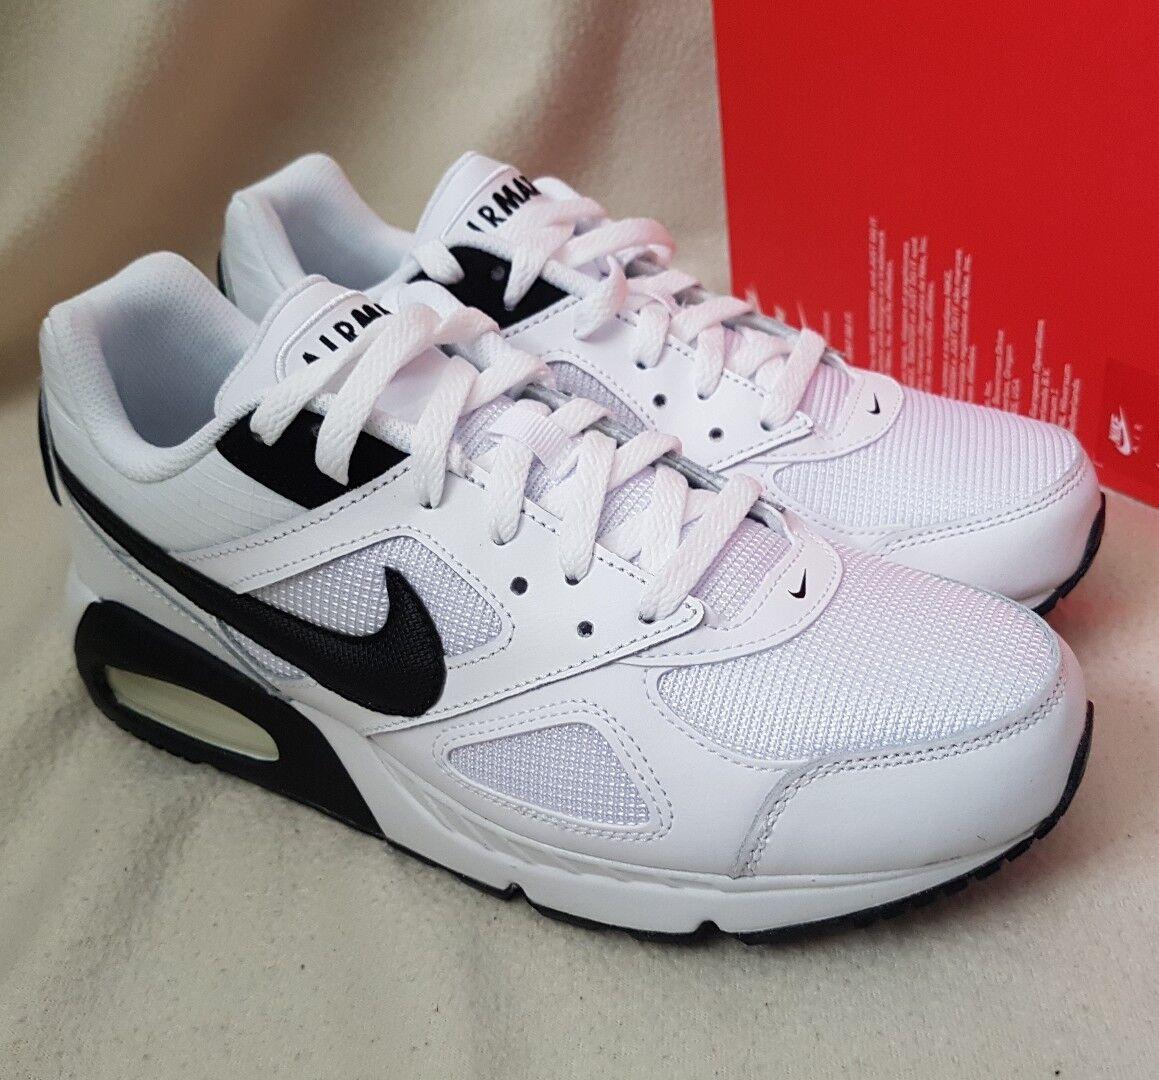 Nike Air Max Ivo Ltr Ltr Ltr Ltr Ltr Scarpe Da Ginnastica Scarpe Da   0fa2af